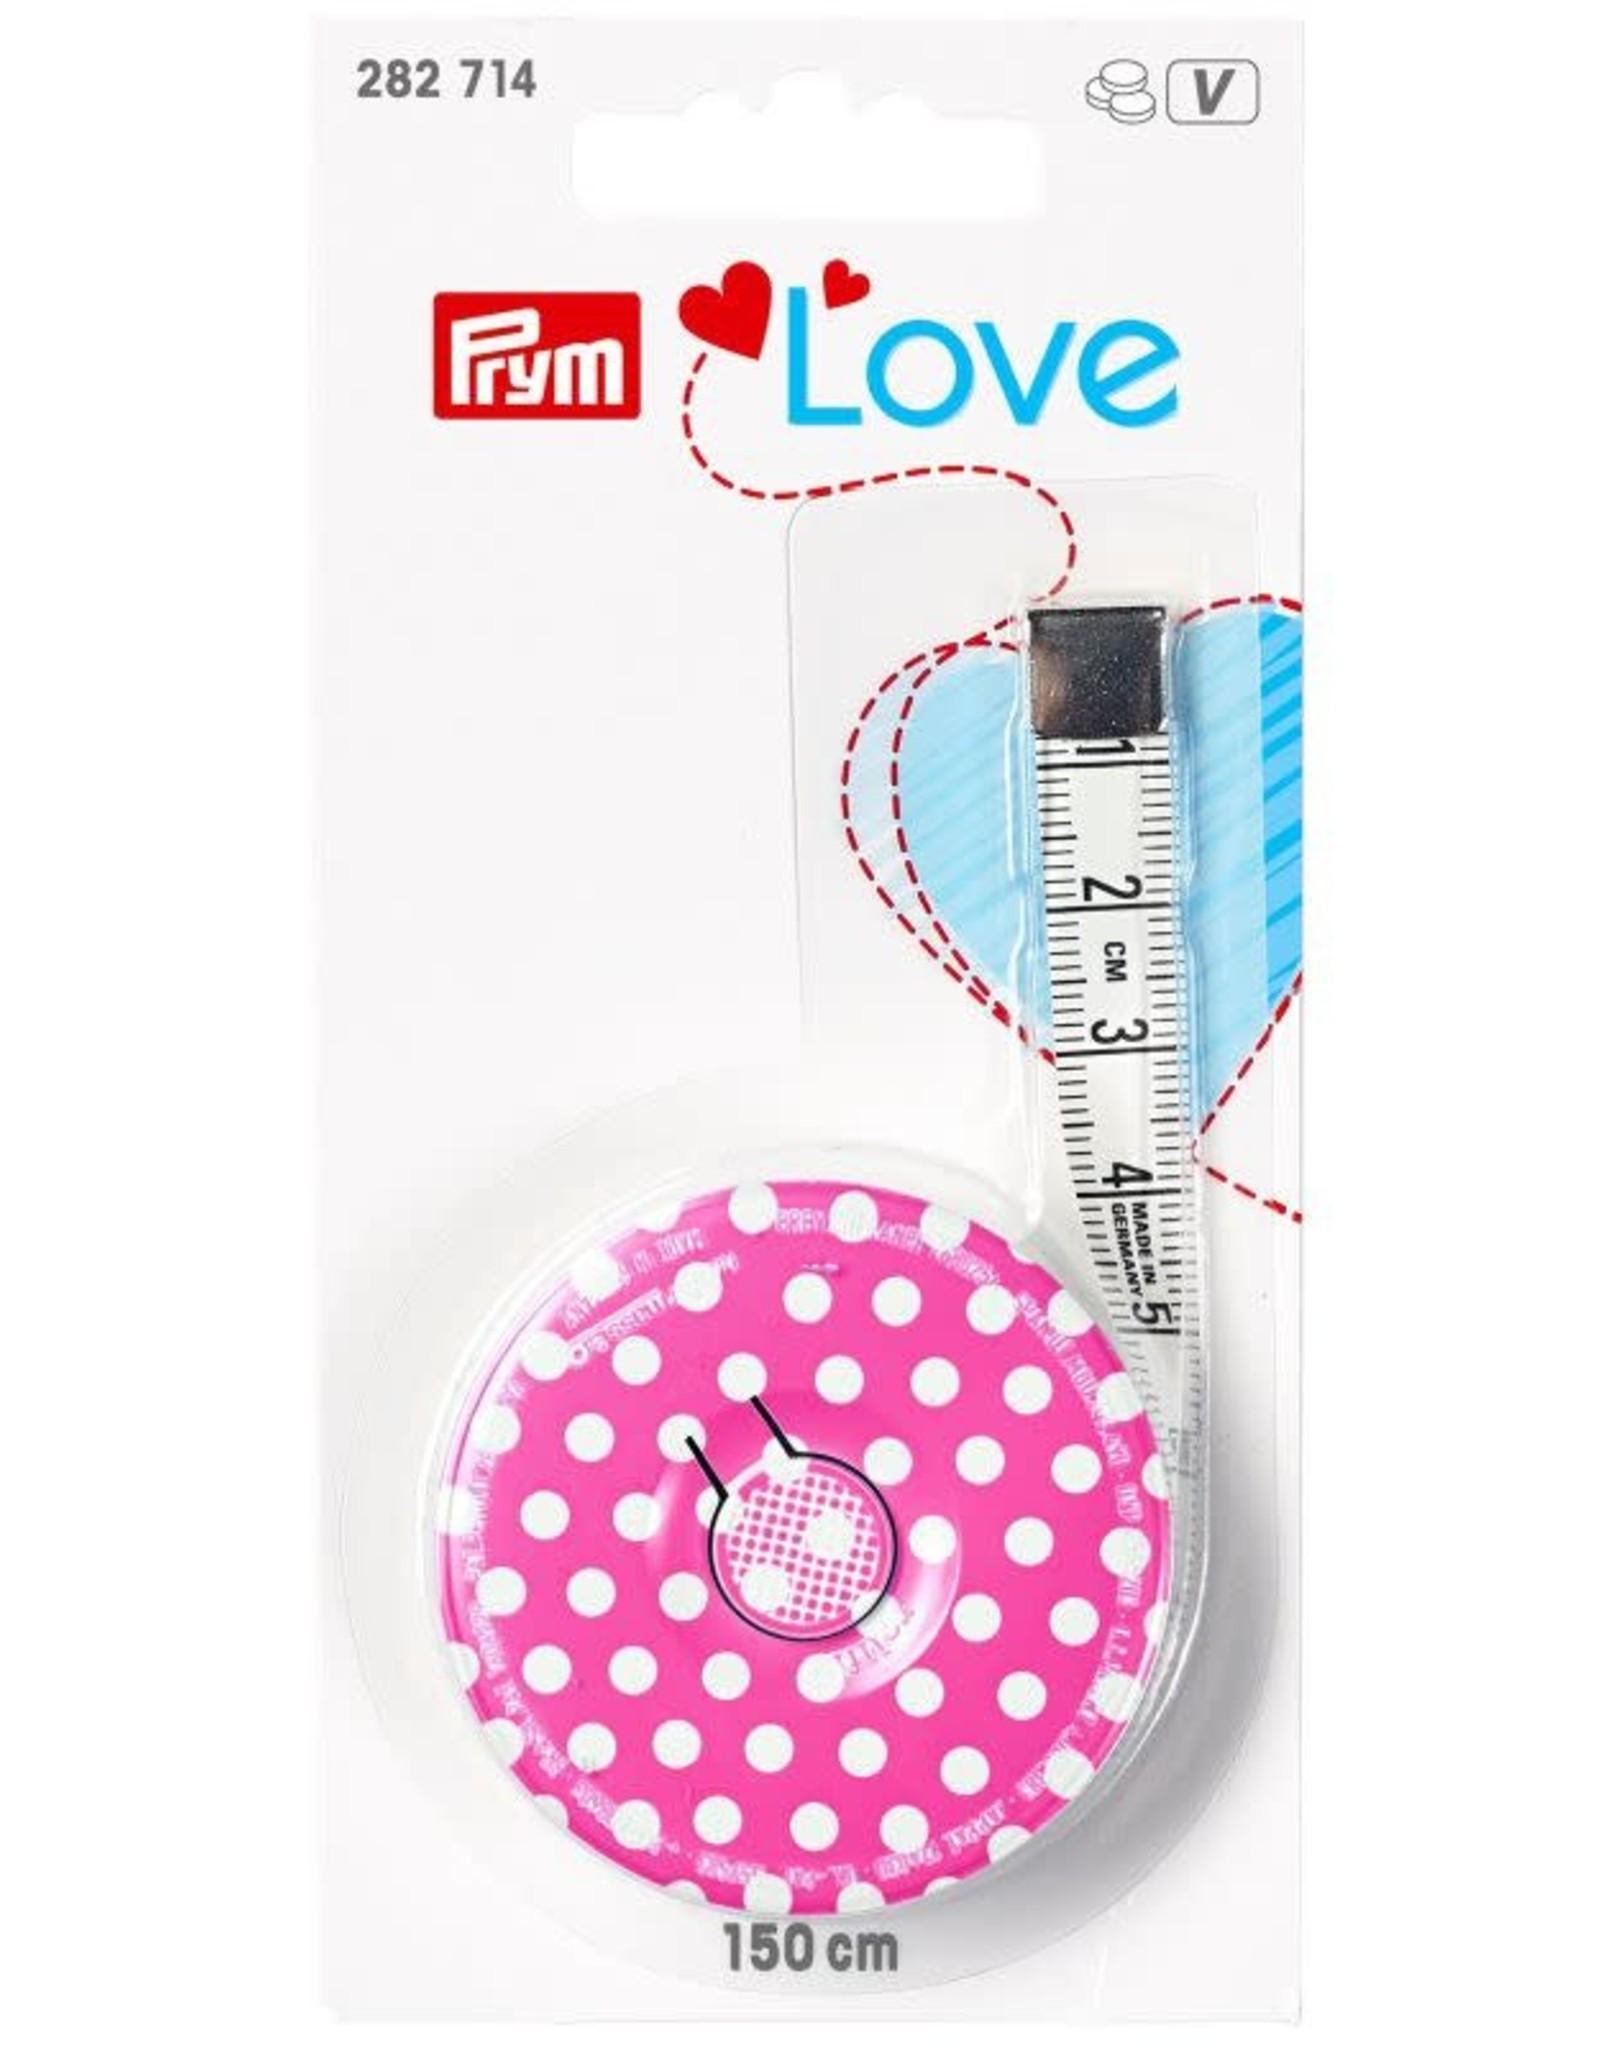 Prym Prym Love 282.714 - Rolcentimeter Roze Dot